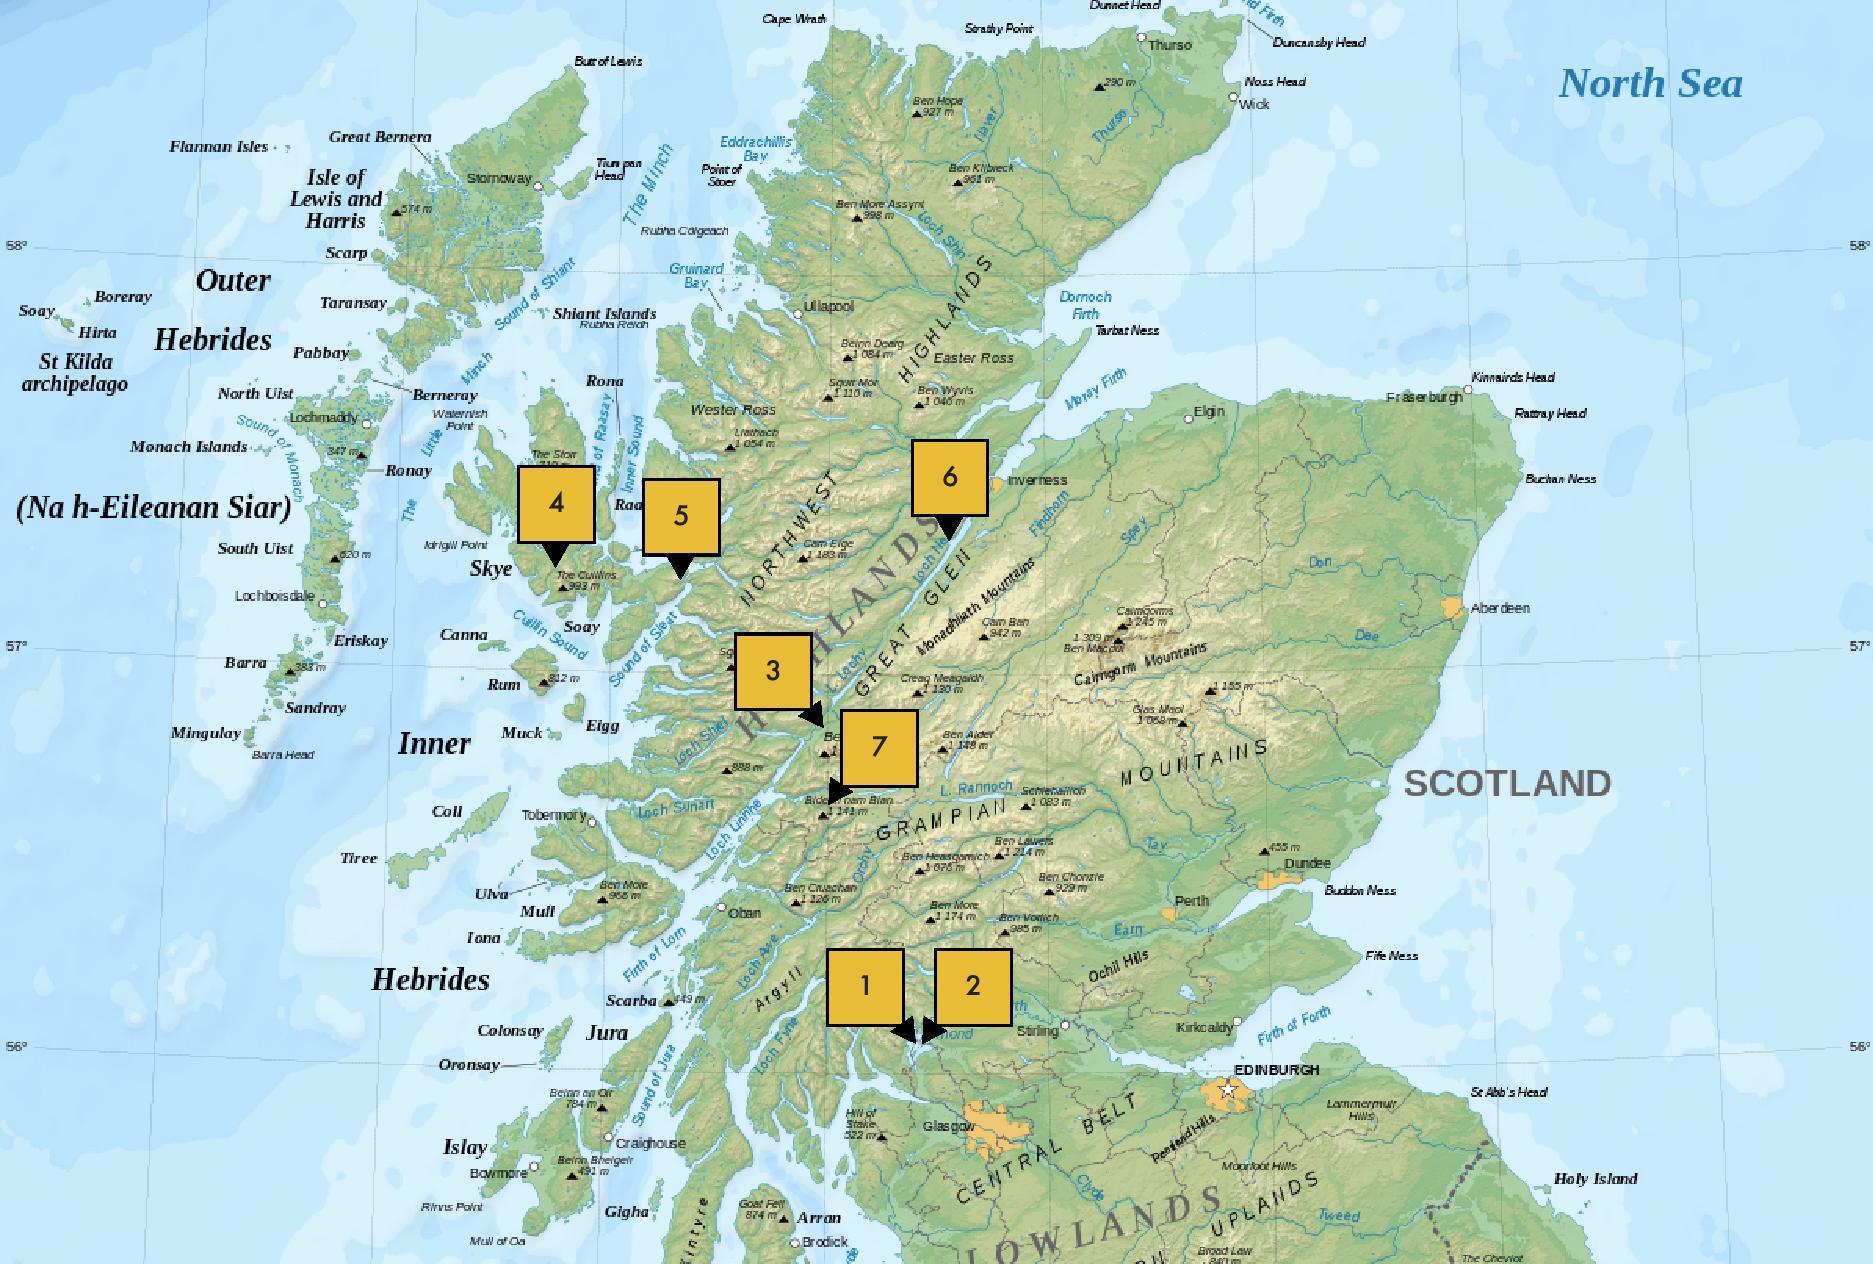 THE TRIAL TRIP: SCOTLAND MAP